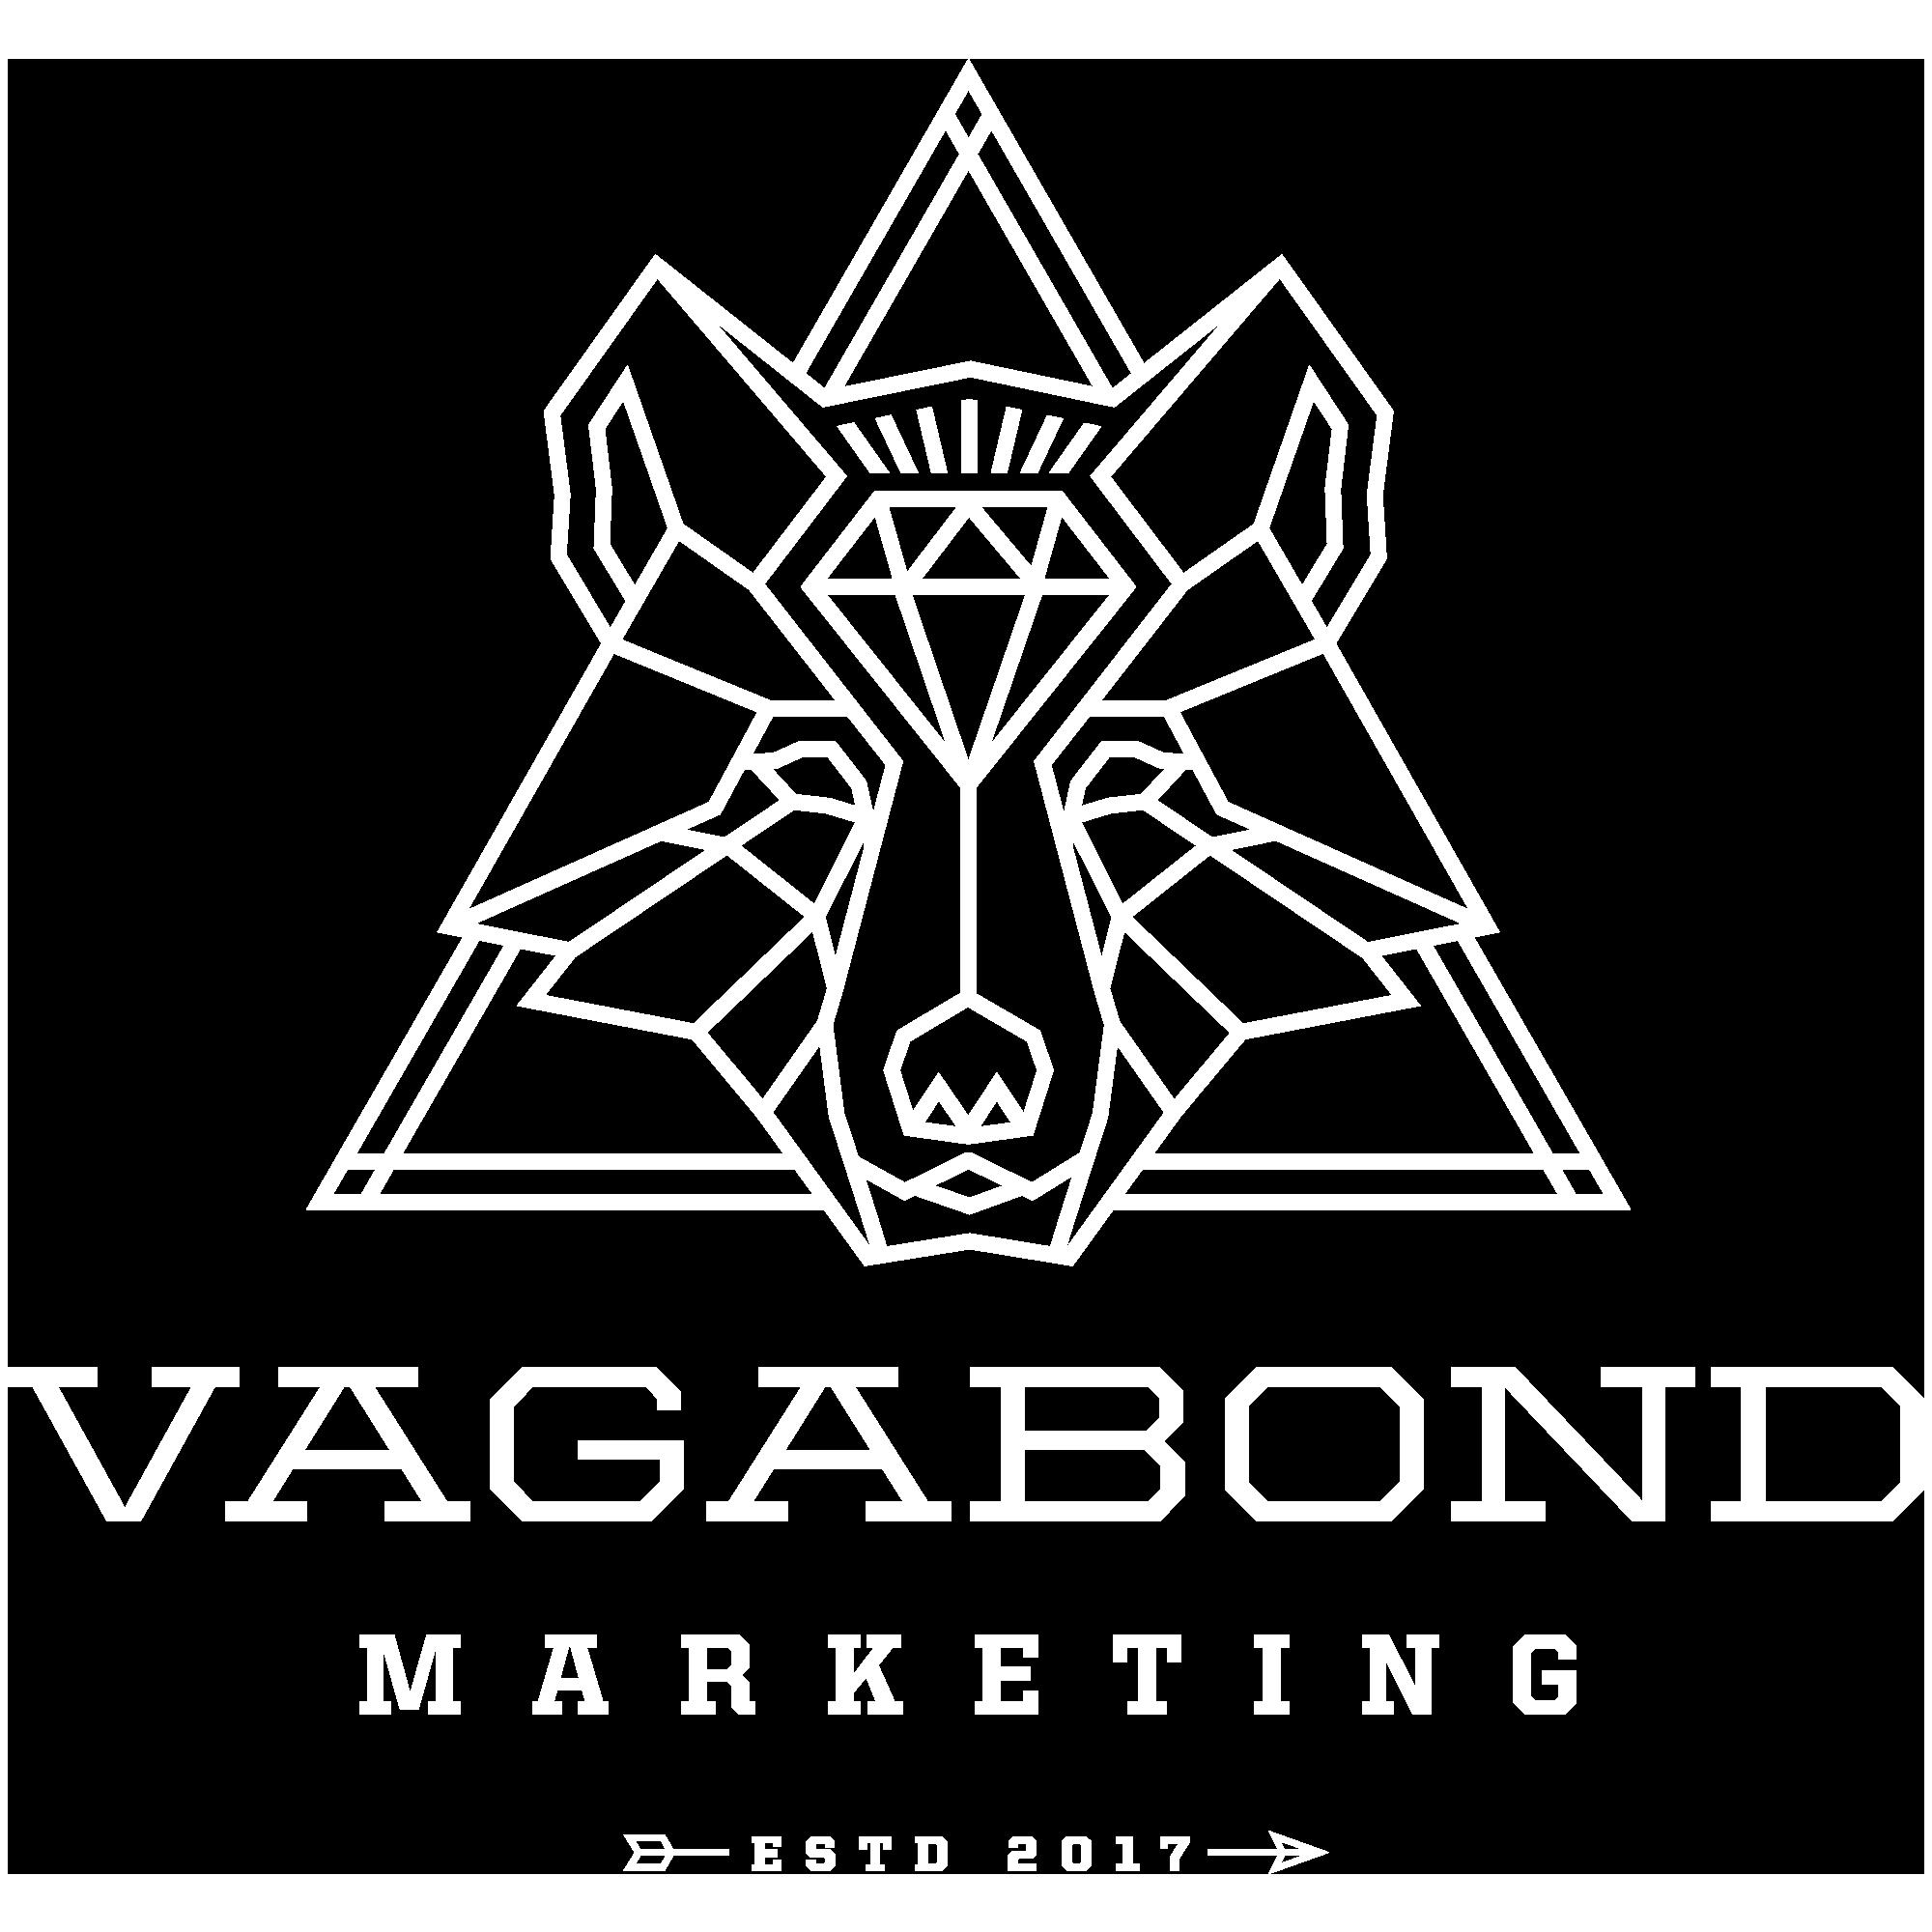 Vagabond_Marketing_Logo_White.png